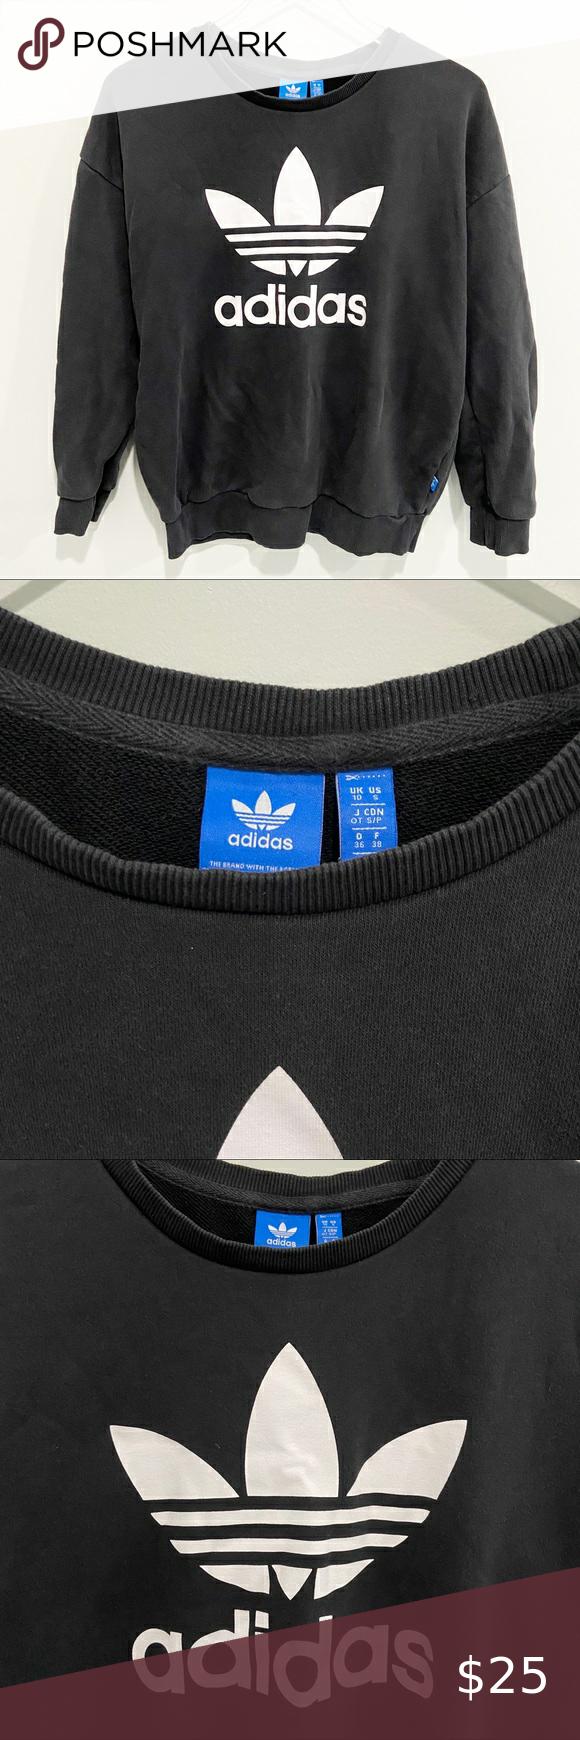 Adidas Trefoil Crew Neck Pullover Sweatshirt Black Black Sweatshirts Adidas Trefoil Black Pullovers [ 1740 x 580 Pixel ]